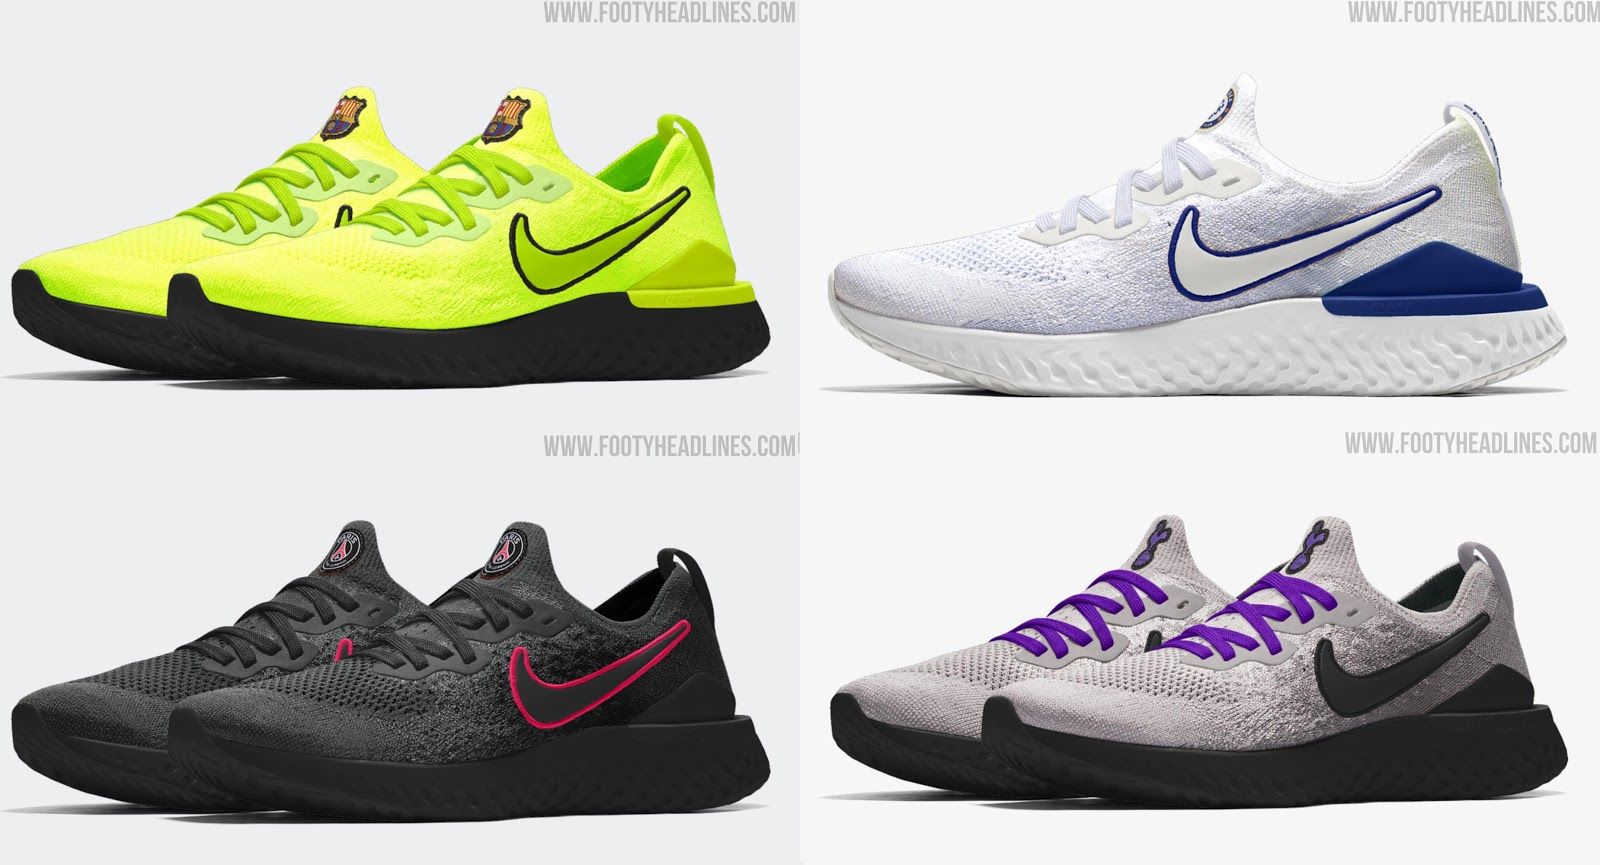 e32206f007c Do you like the Nike Epic React Flyknit 2 Shoes for FC Barcelona